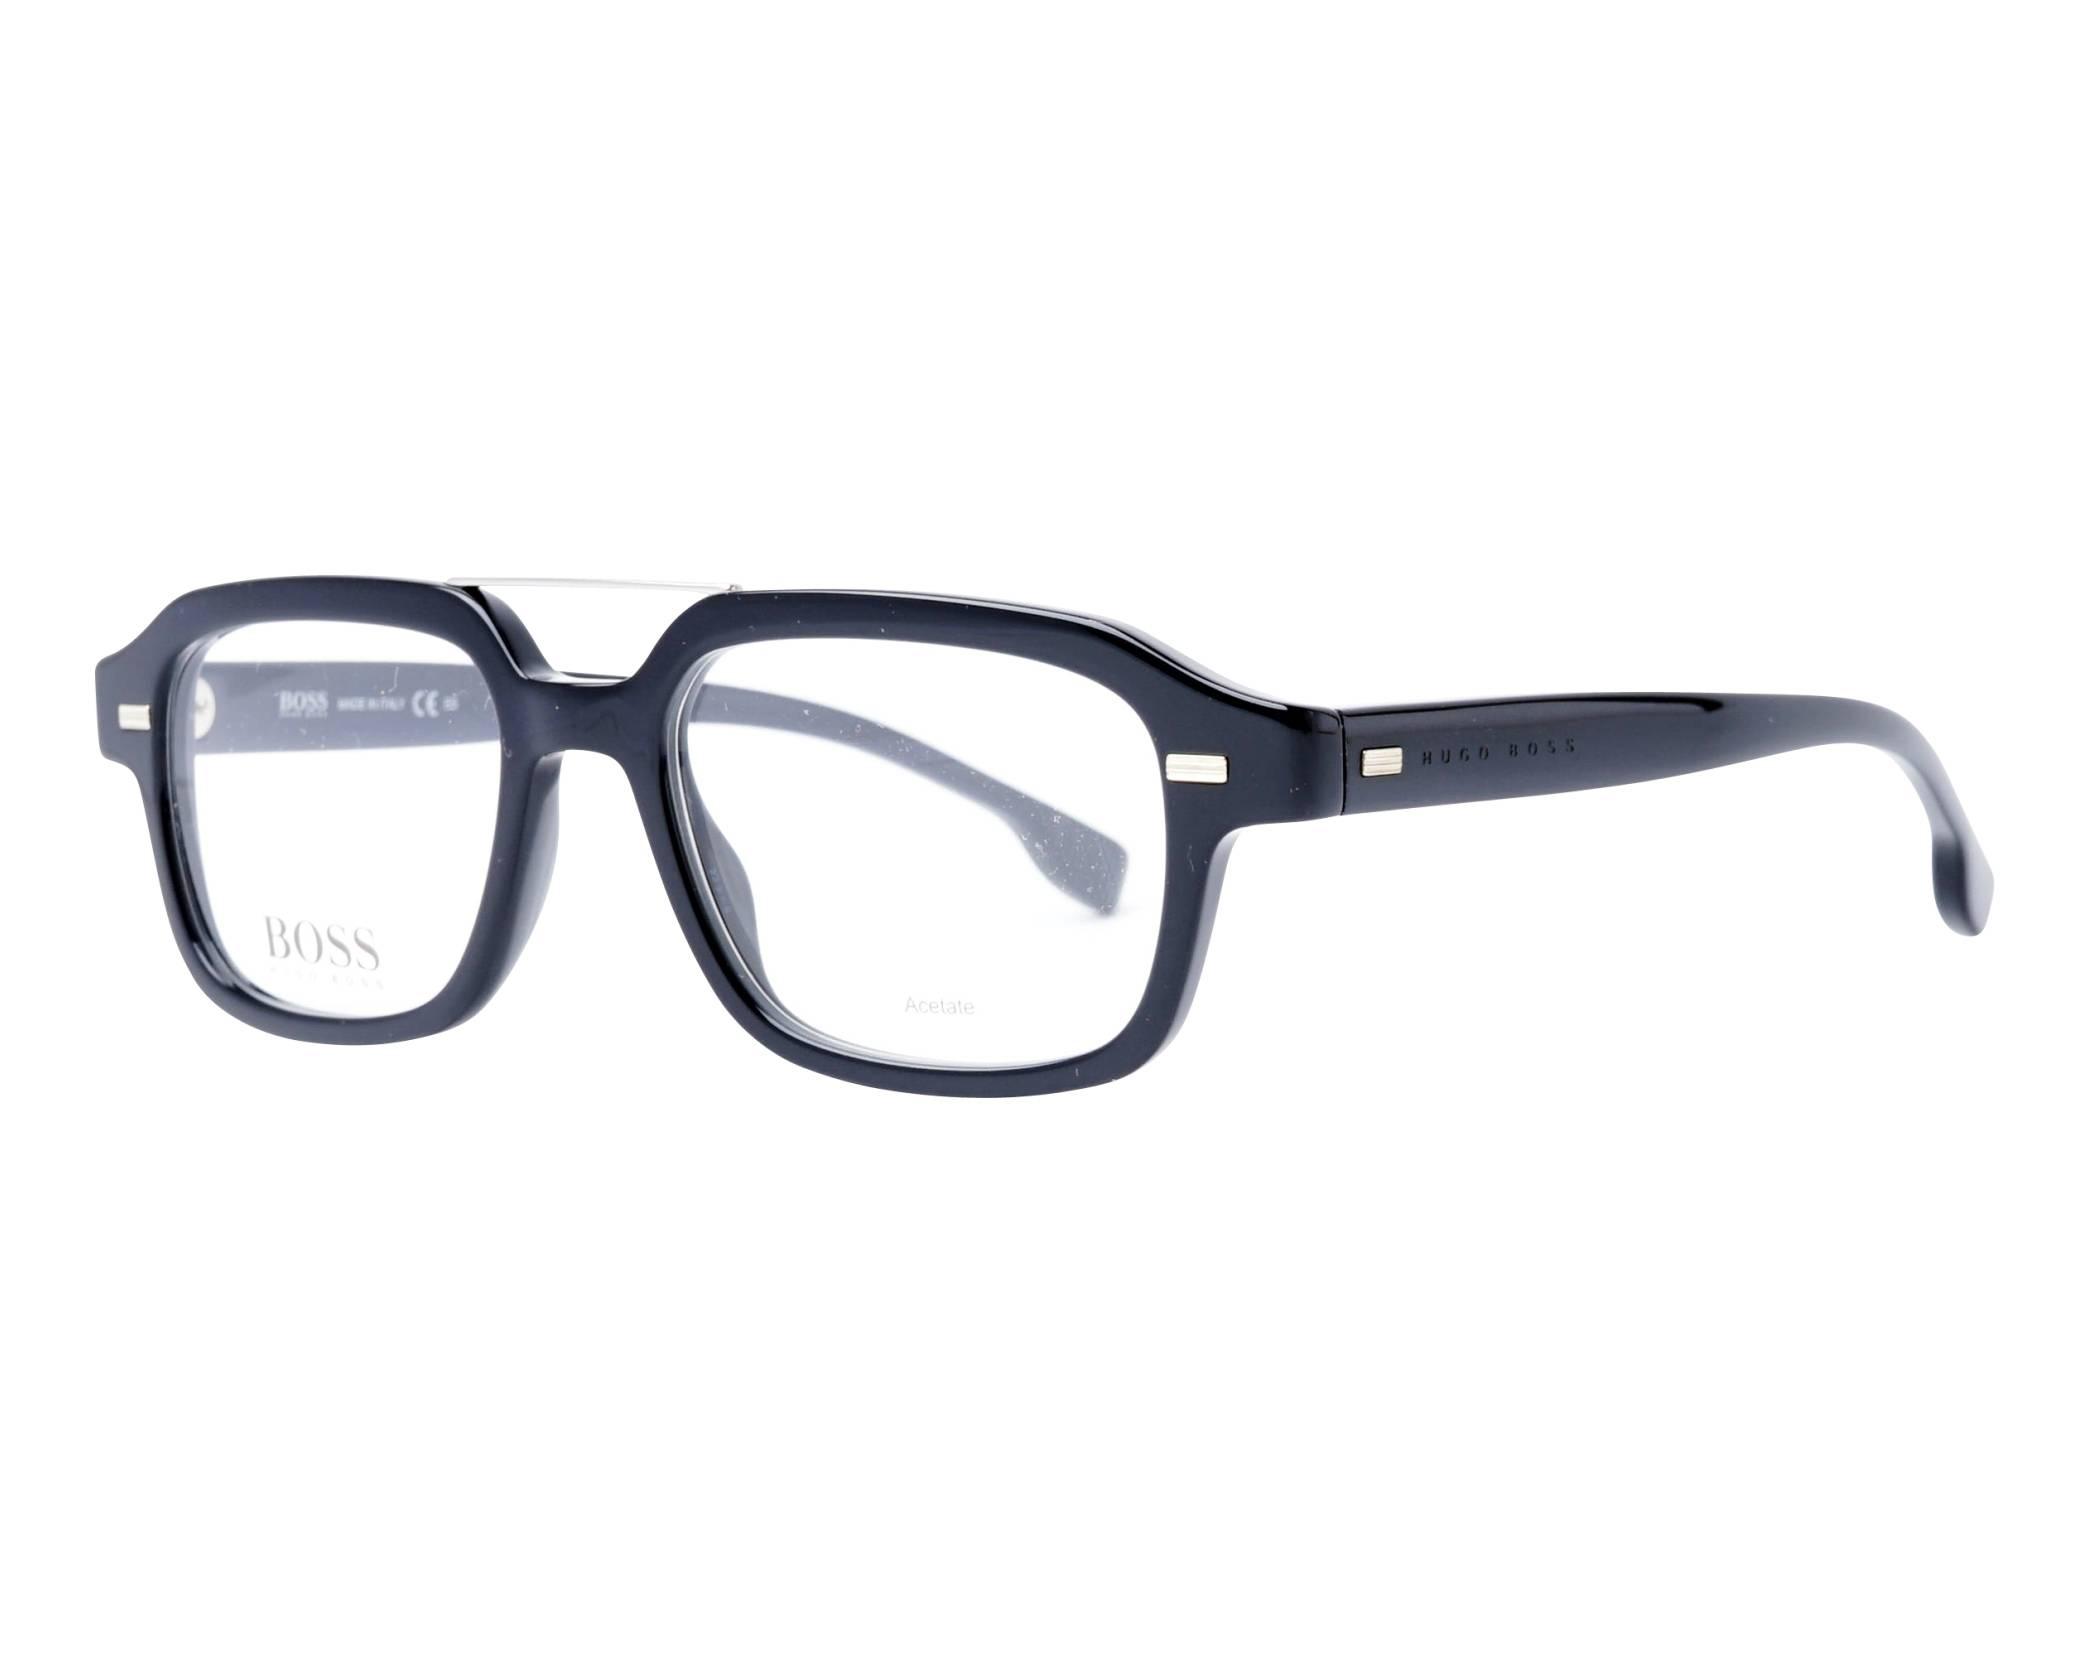 f72585600 Gafas Graduadas Hugo Boss BOSS-1001 807 51-18 Negra vista de perfil